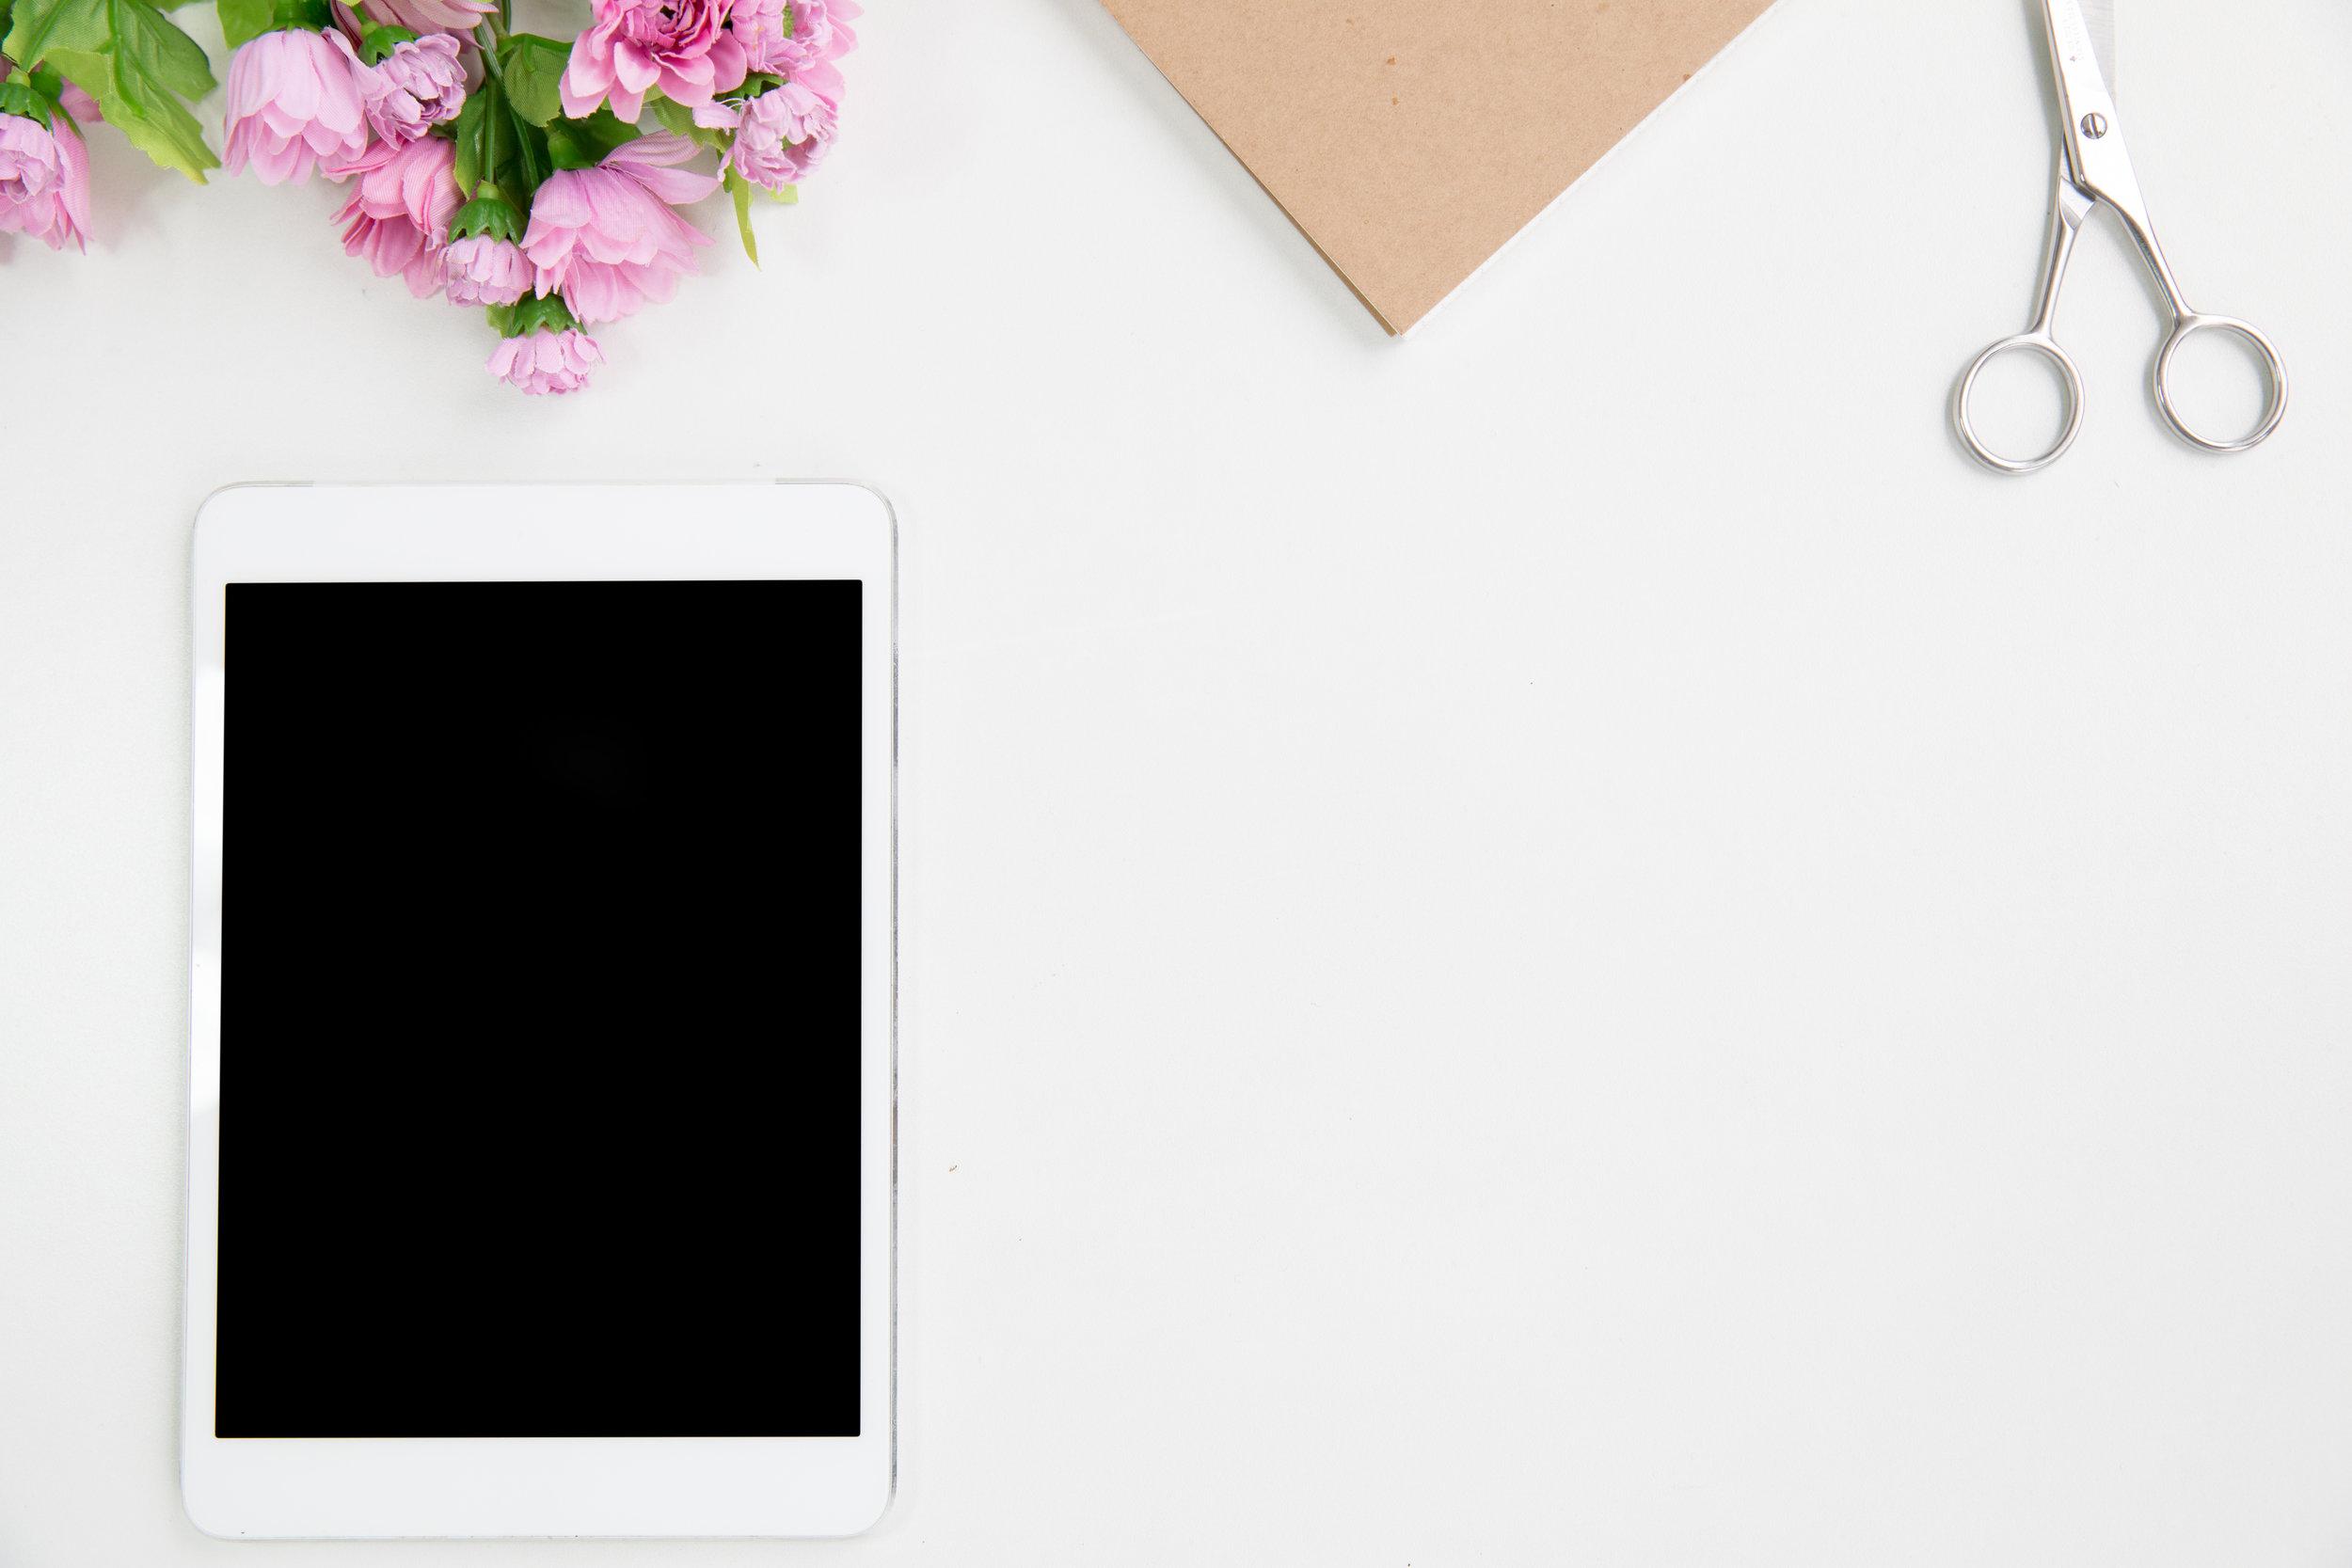 Working on scissor skills on an iPad?? REALLY?